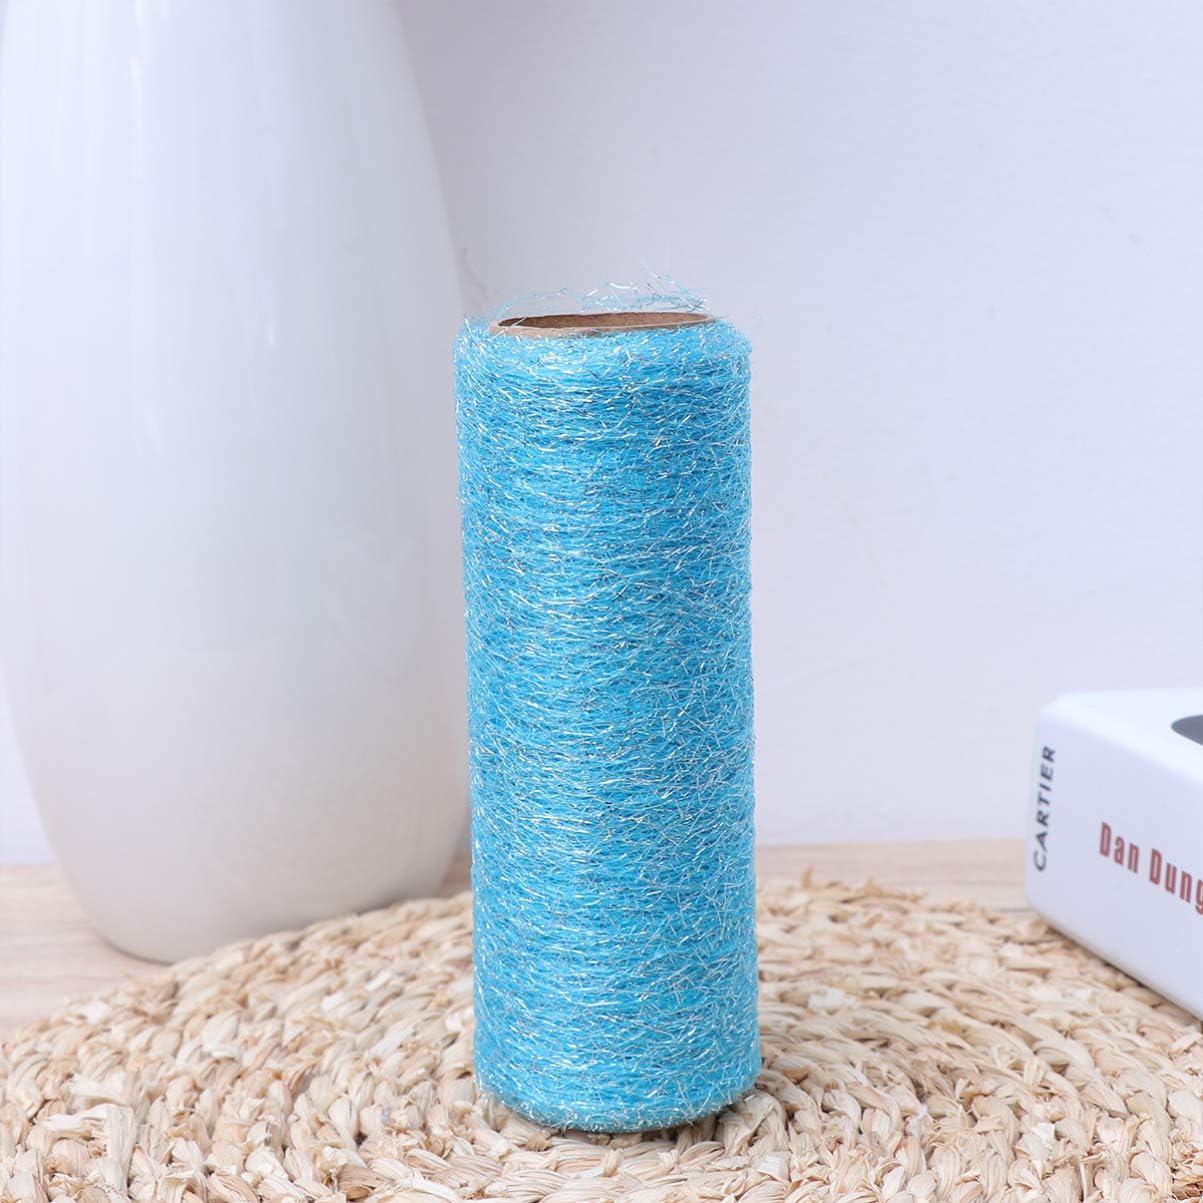 Yellow HEALLILY Tulle Ribbon Netting Rolls Organza Fabric for Wedding Decoration Bow Tutu Skirt DIY Craft Sewing 15cm 10 Yards